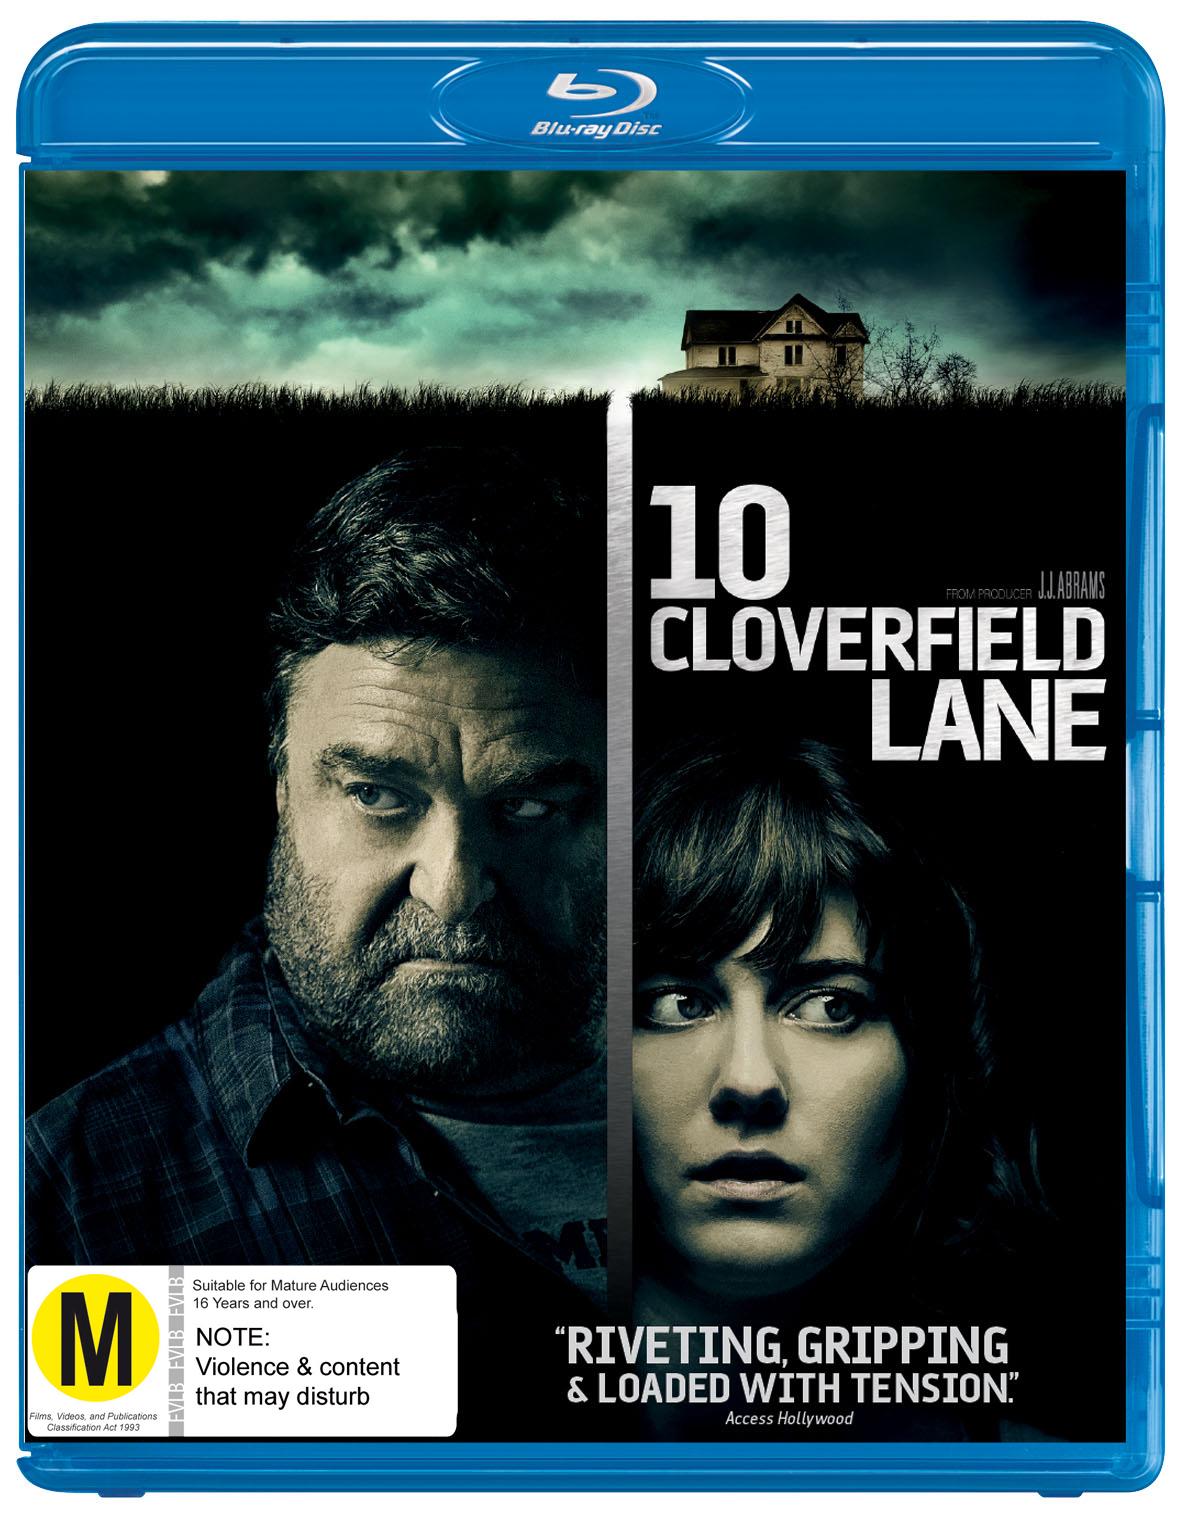 10 Cloverfield Lane on Blu-ray image